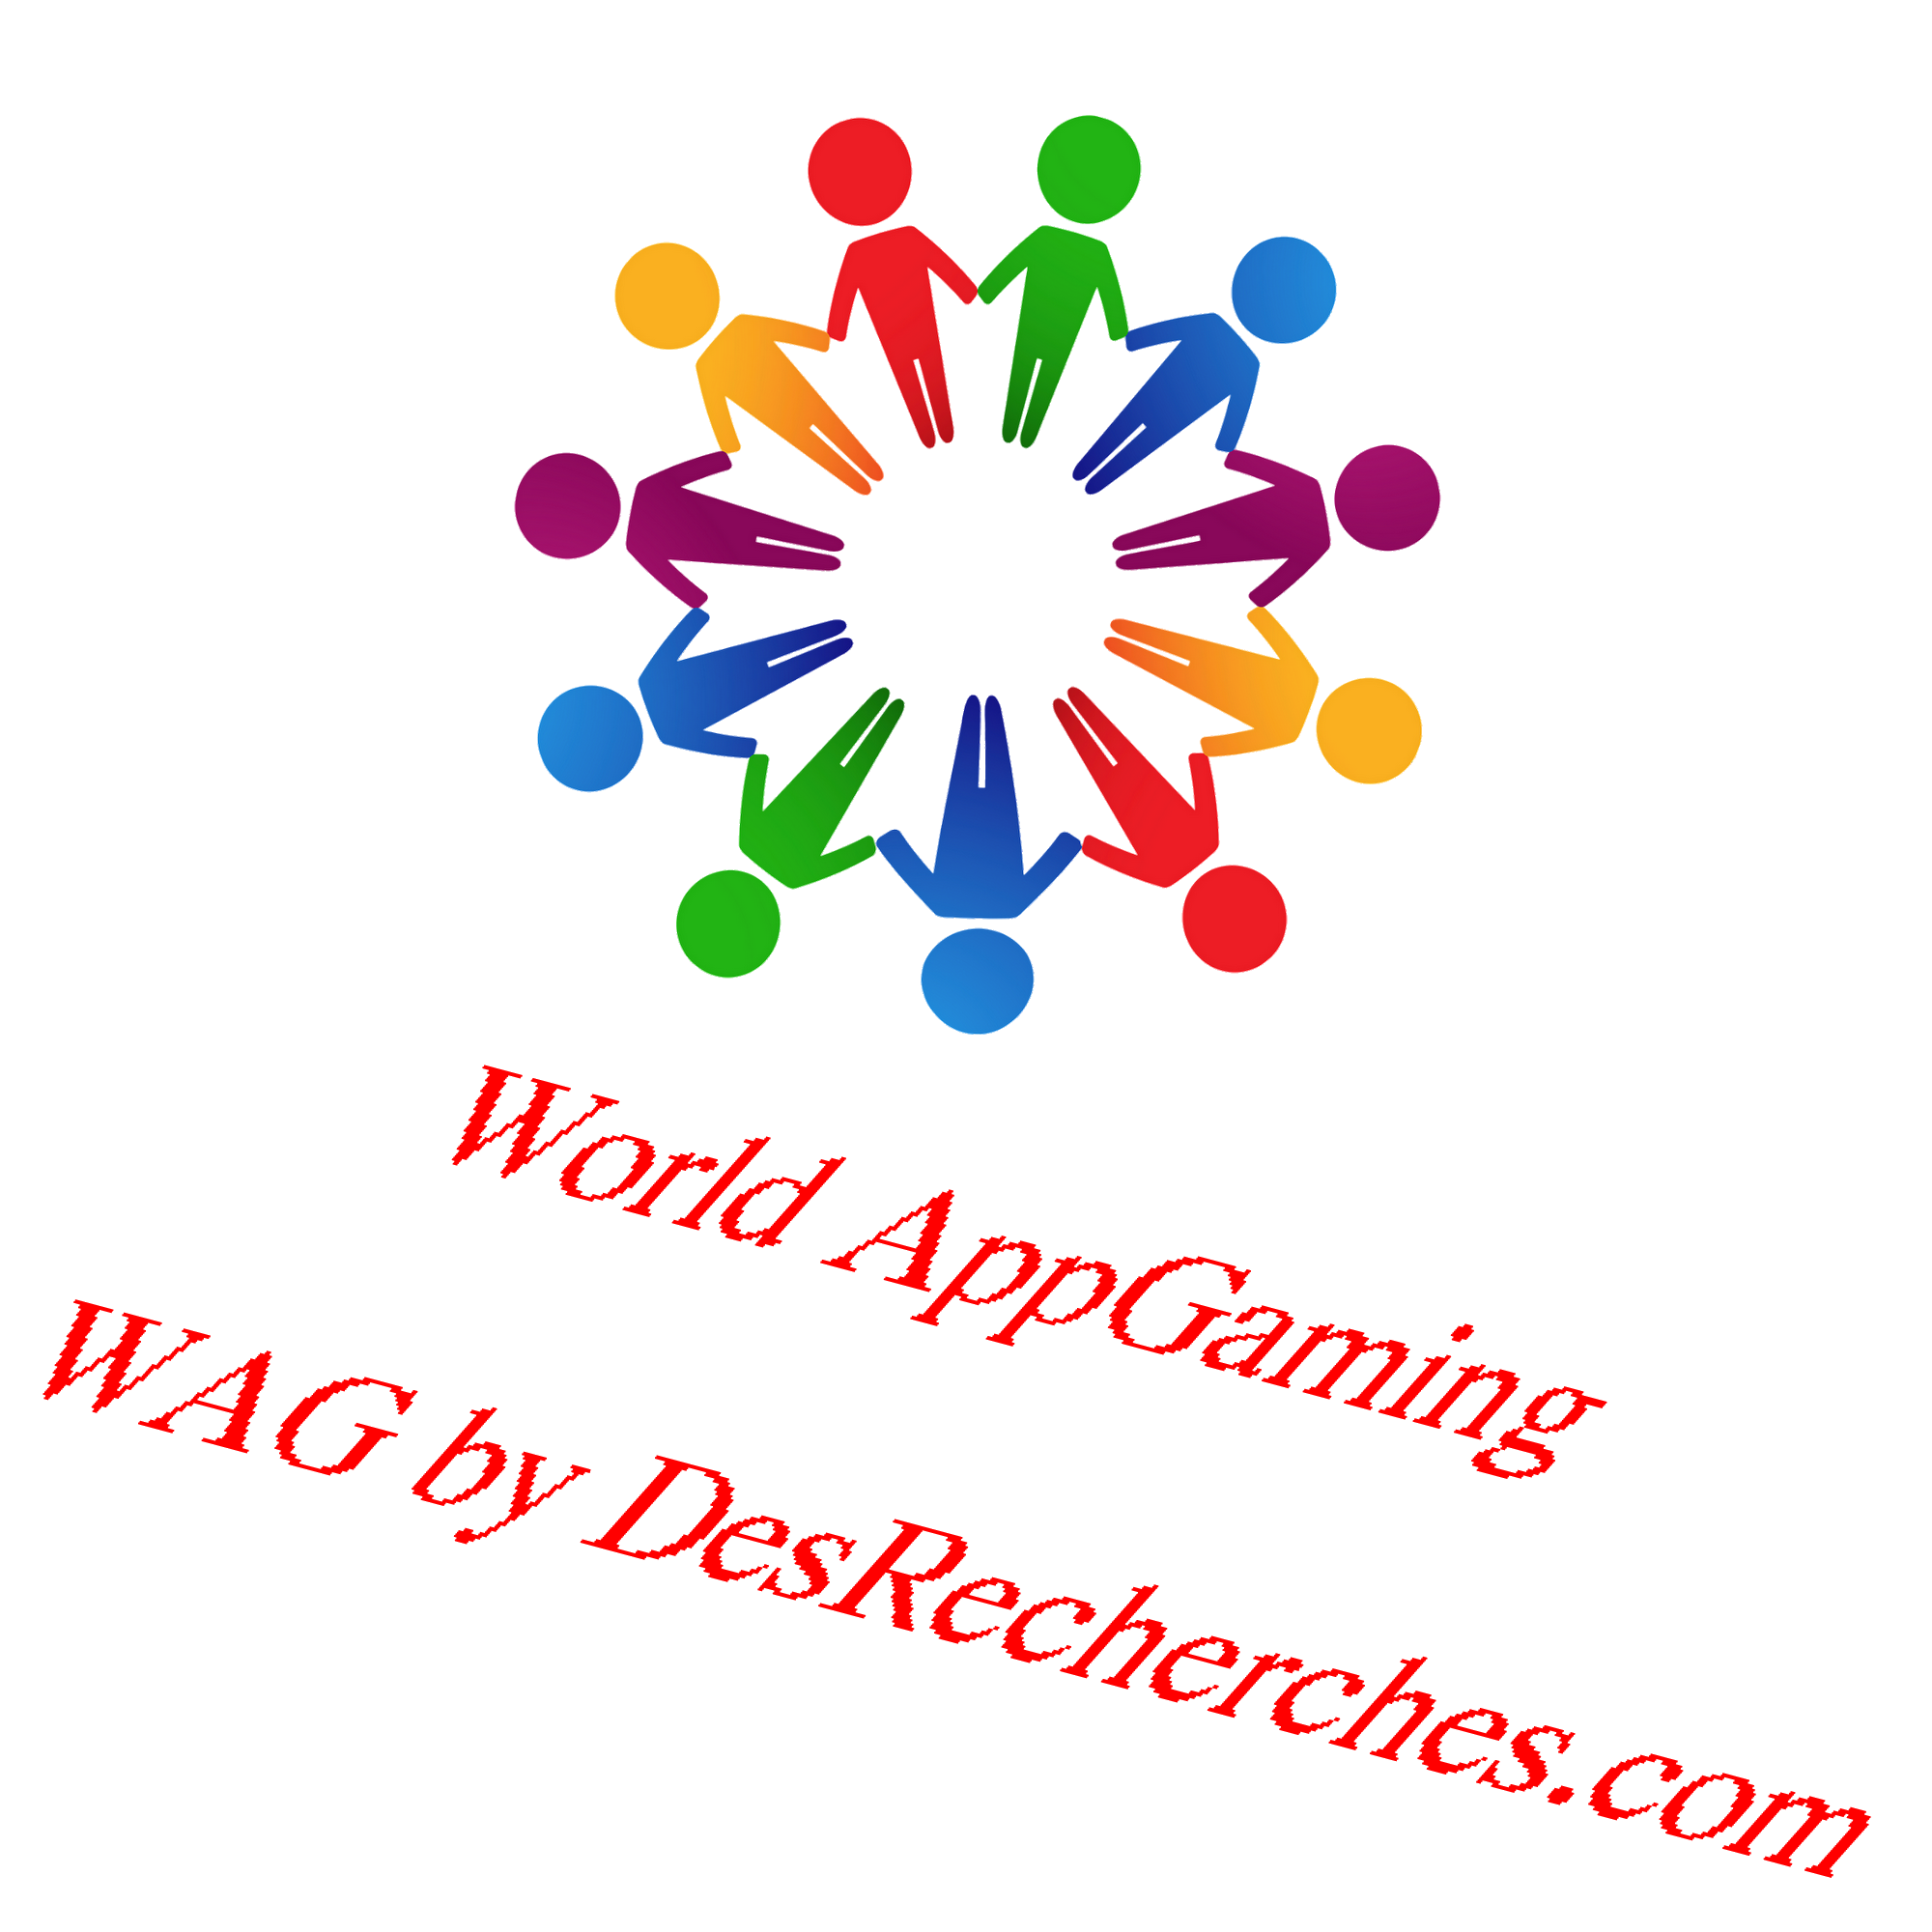 WAG by DesRecherches.com (transparence) - Logo 1